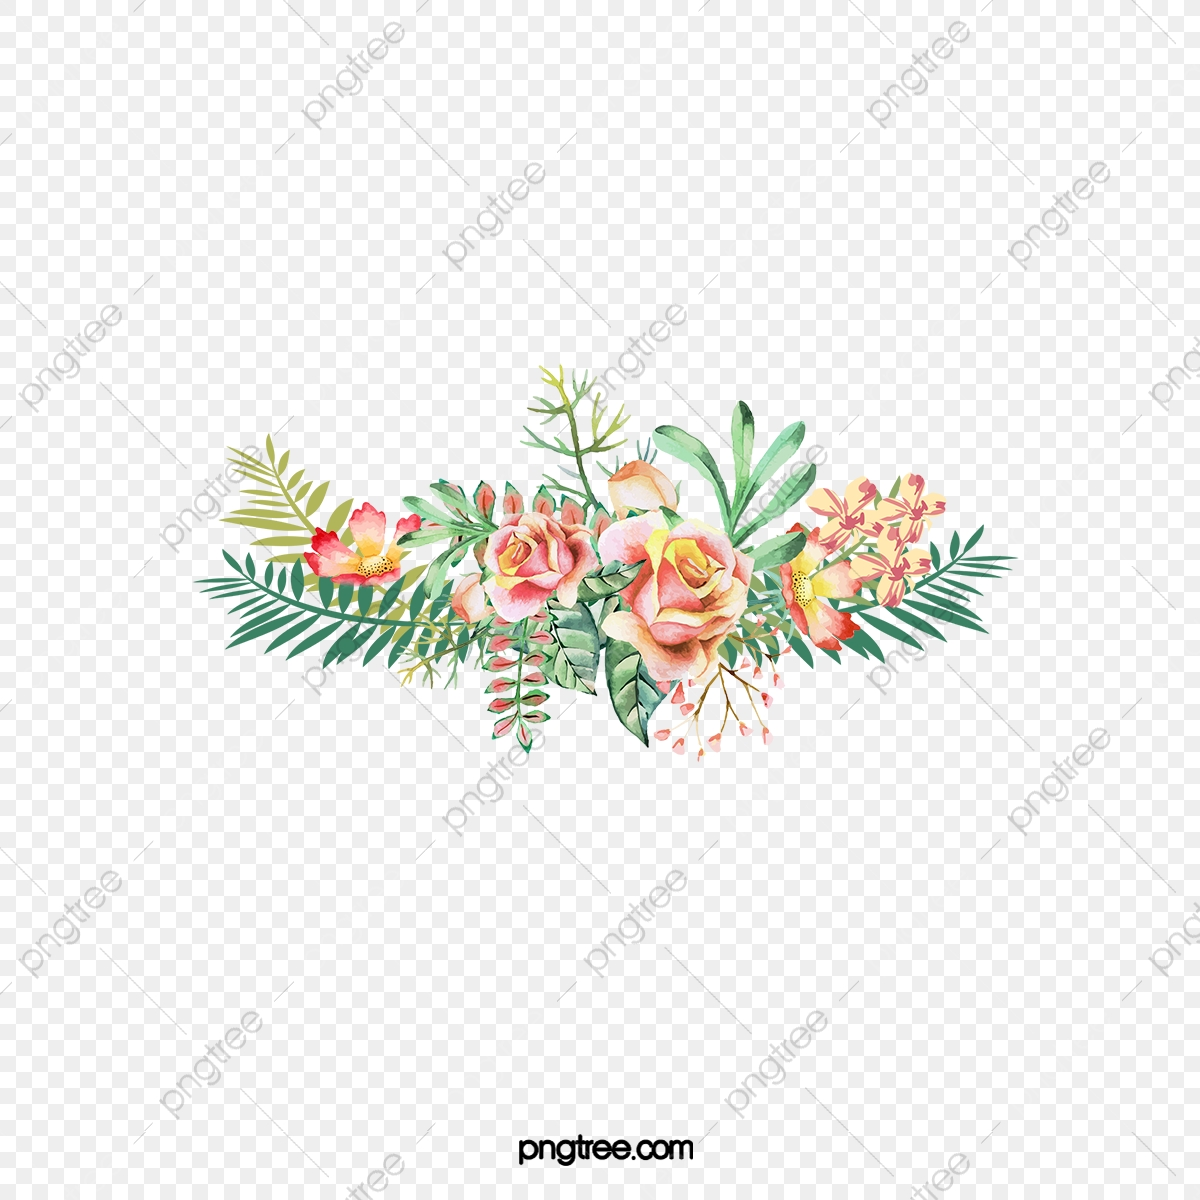 Flower clipart logo. Watercolor bouquet of flowers